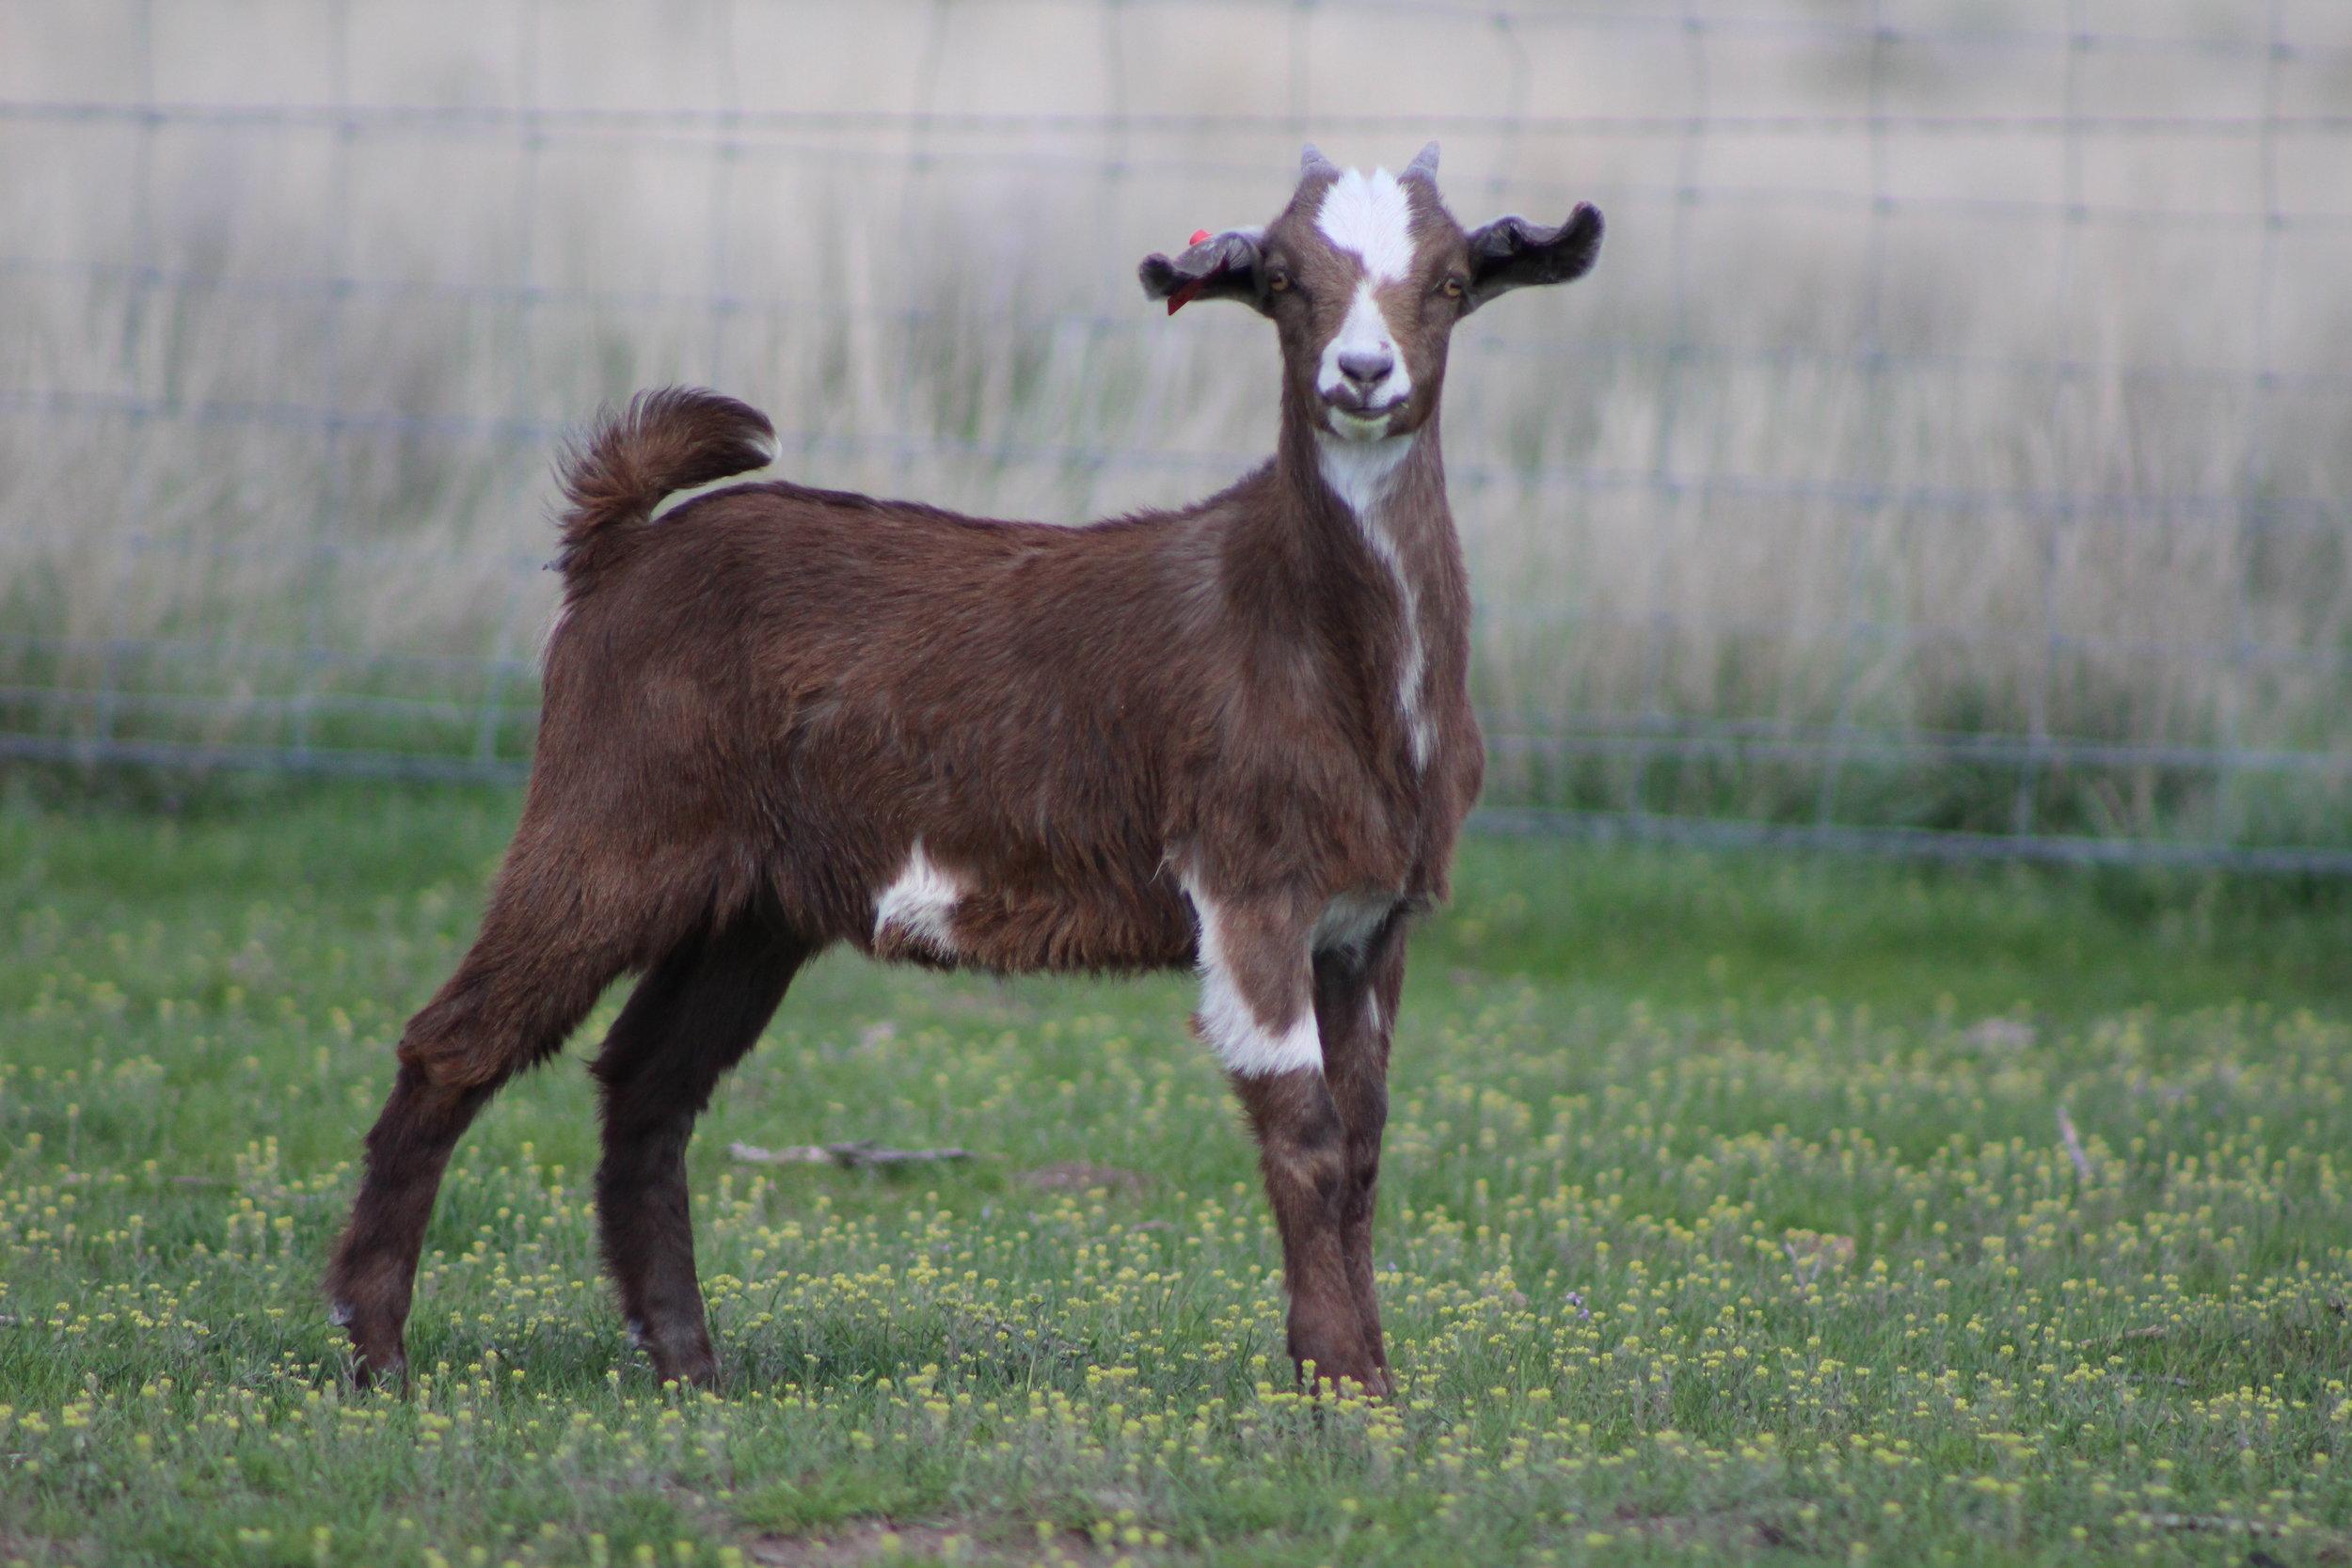 RRG    100% NZ reg. Kiko  Dam:  Sire: GOT Rusty  Date of Birth:  Twin  Birth Weight: Lb  Weaning Weight: Lbs  CAE, Cl, Johannes clean herd